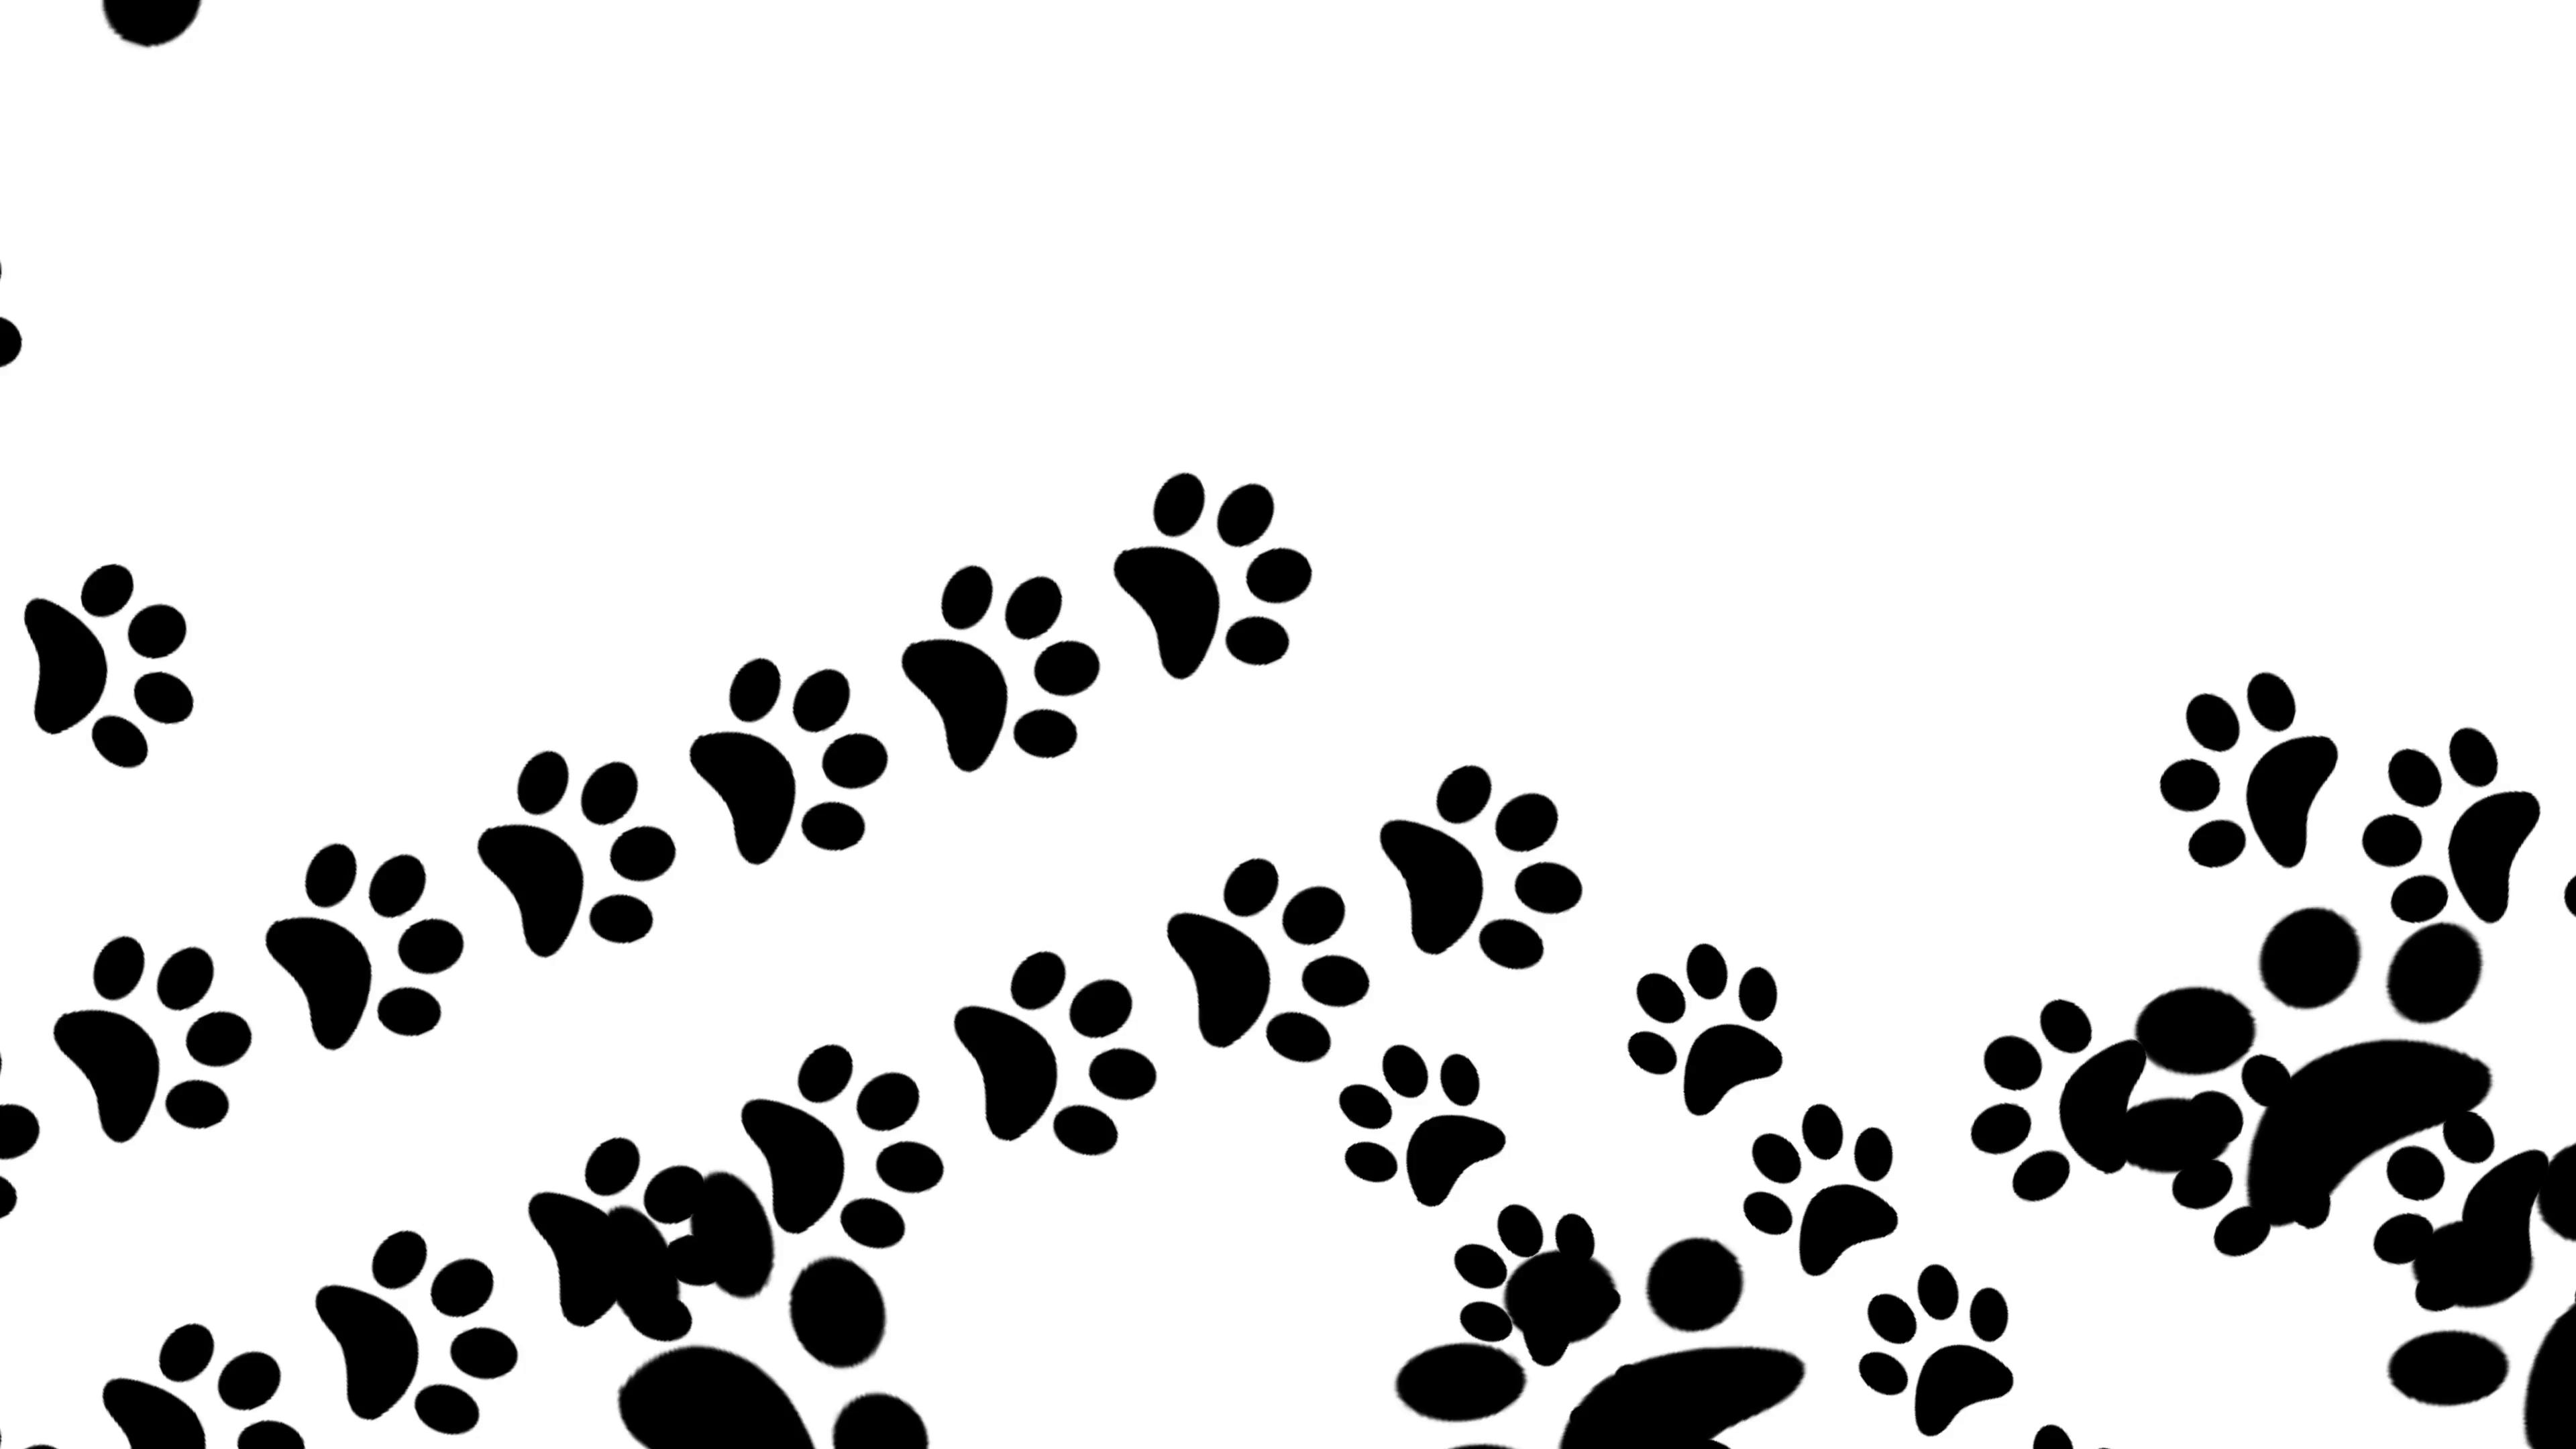 3840x2160 Paw Prints Animal Feet Foot Footprints Pawprints Dog Cat